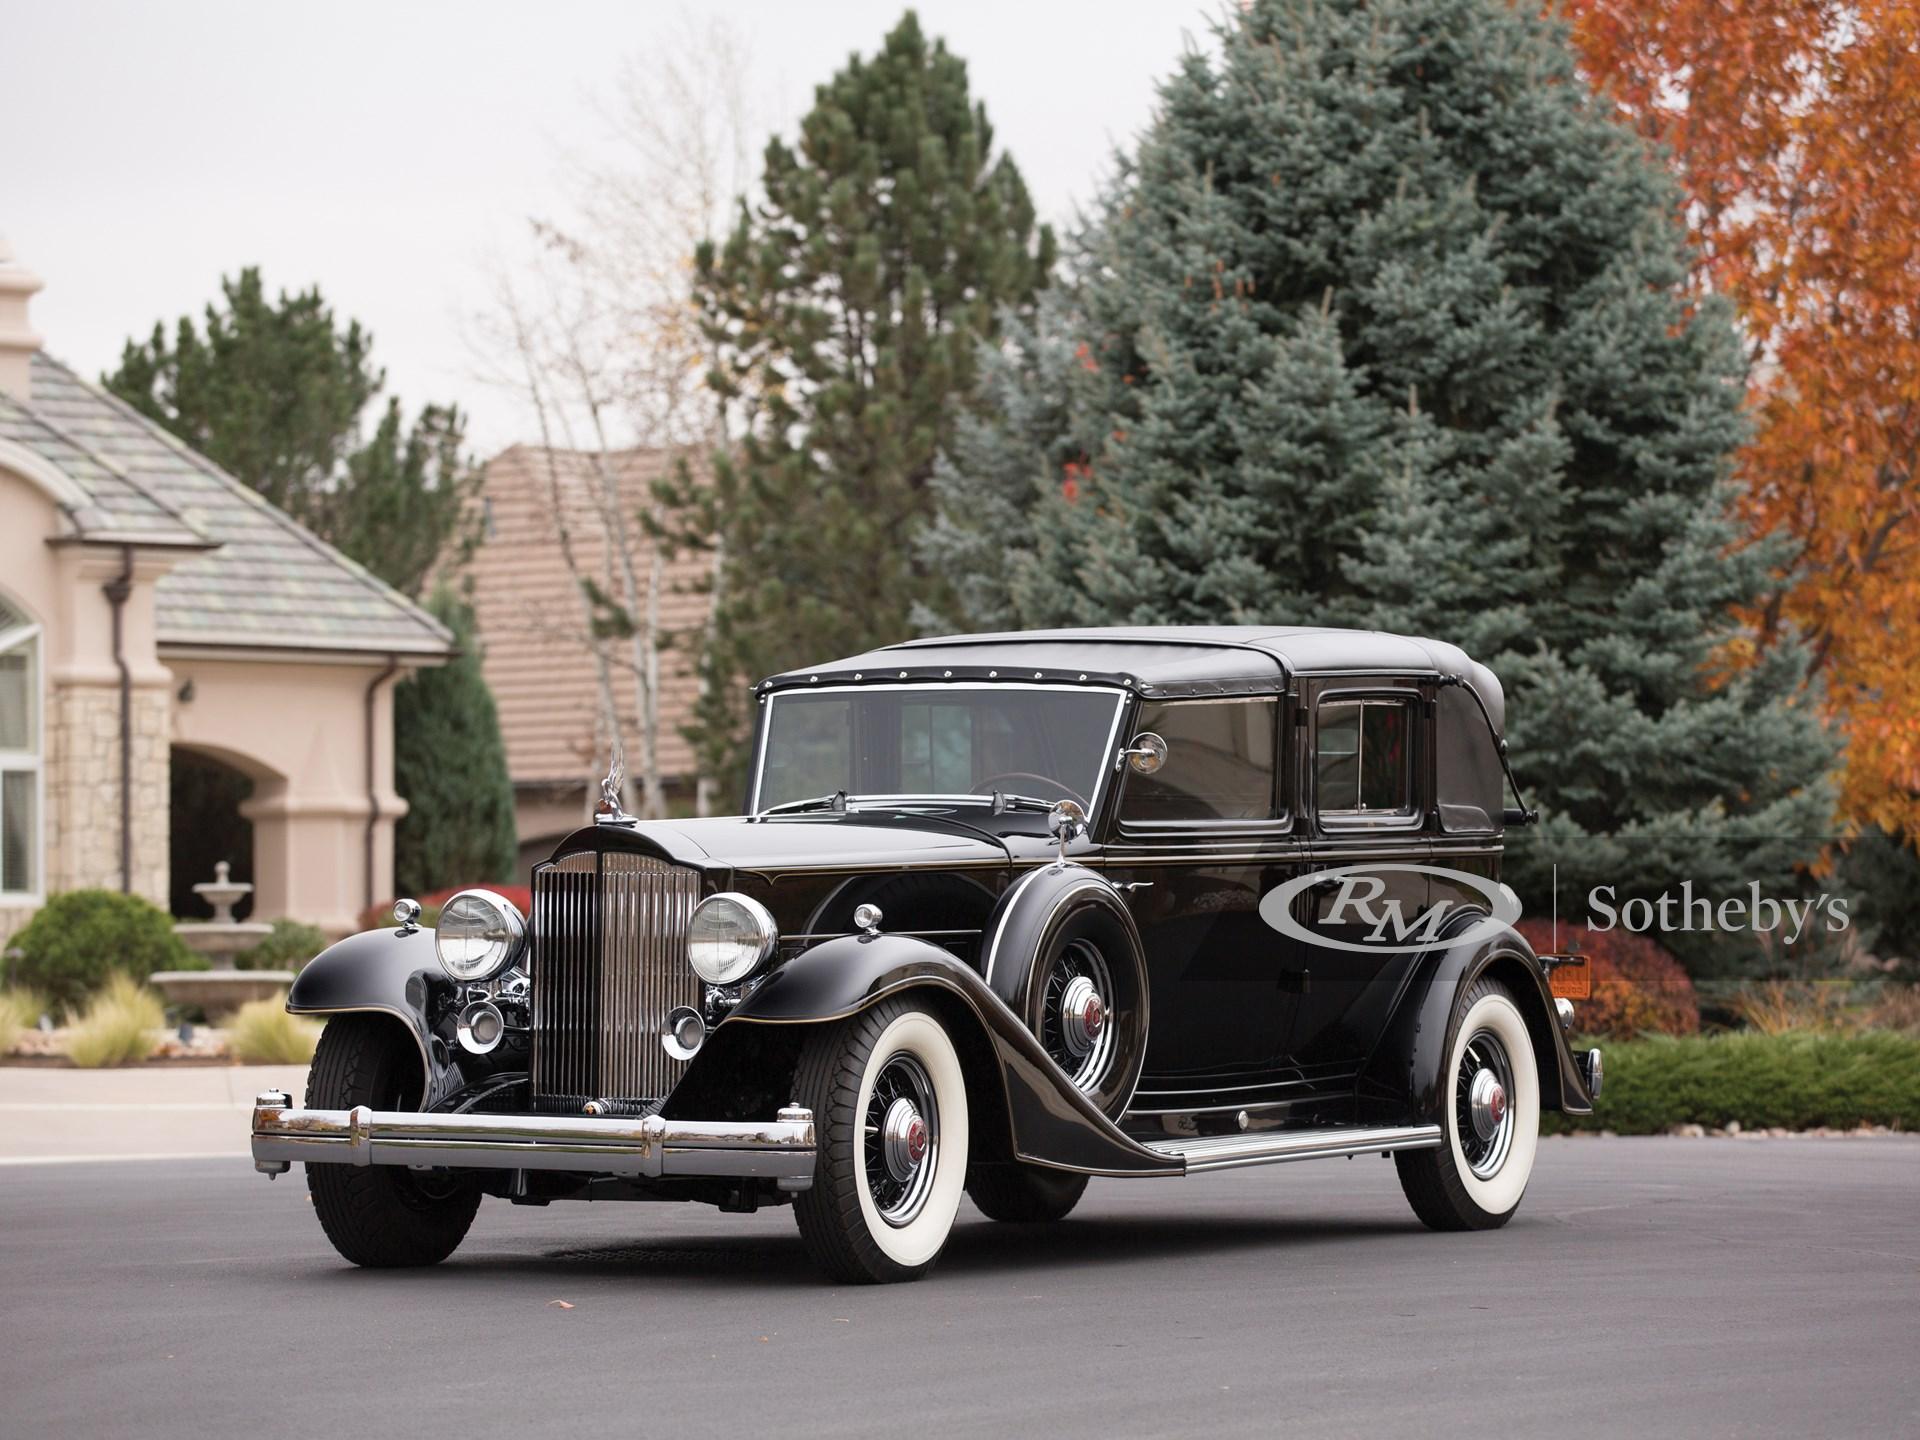 1933 Packard Twelve Individual Custom All-Weather Town Car Landaulet by LeBaron